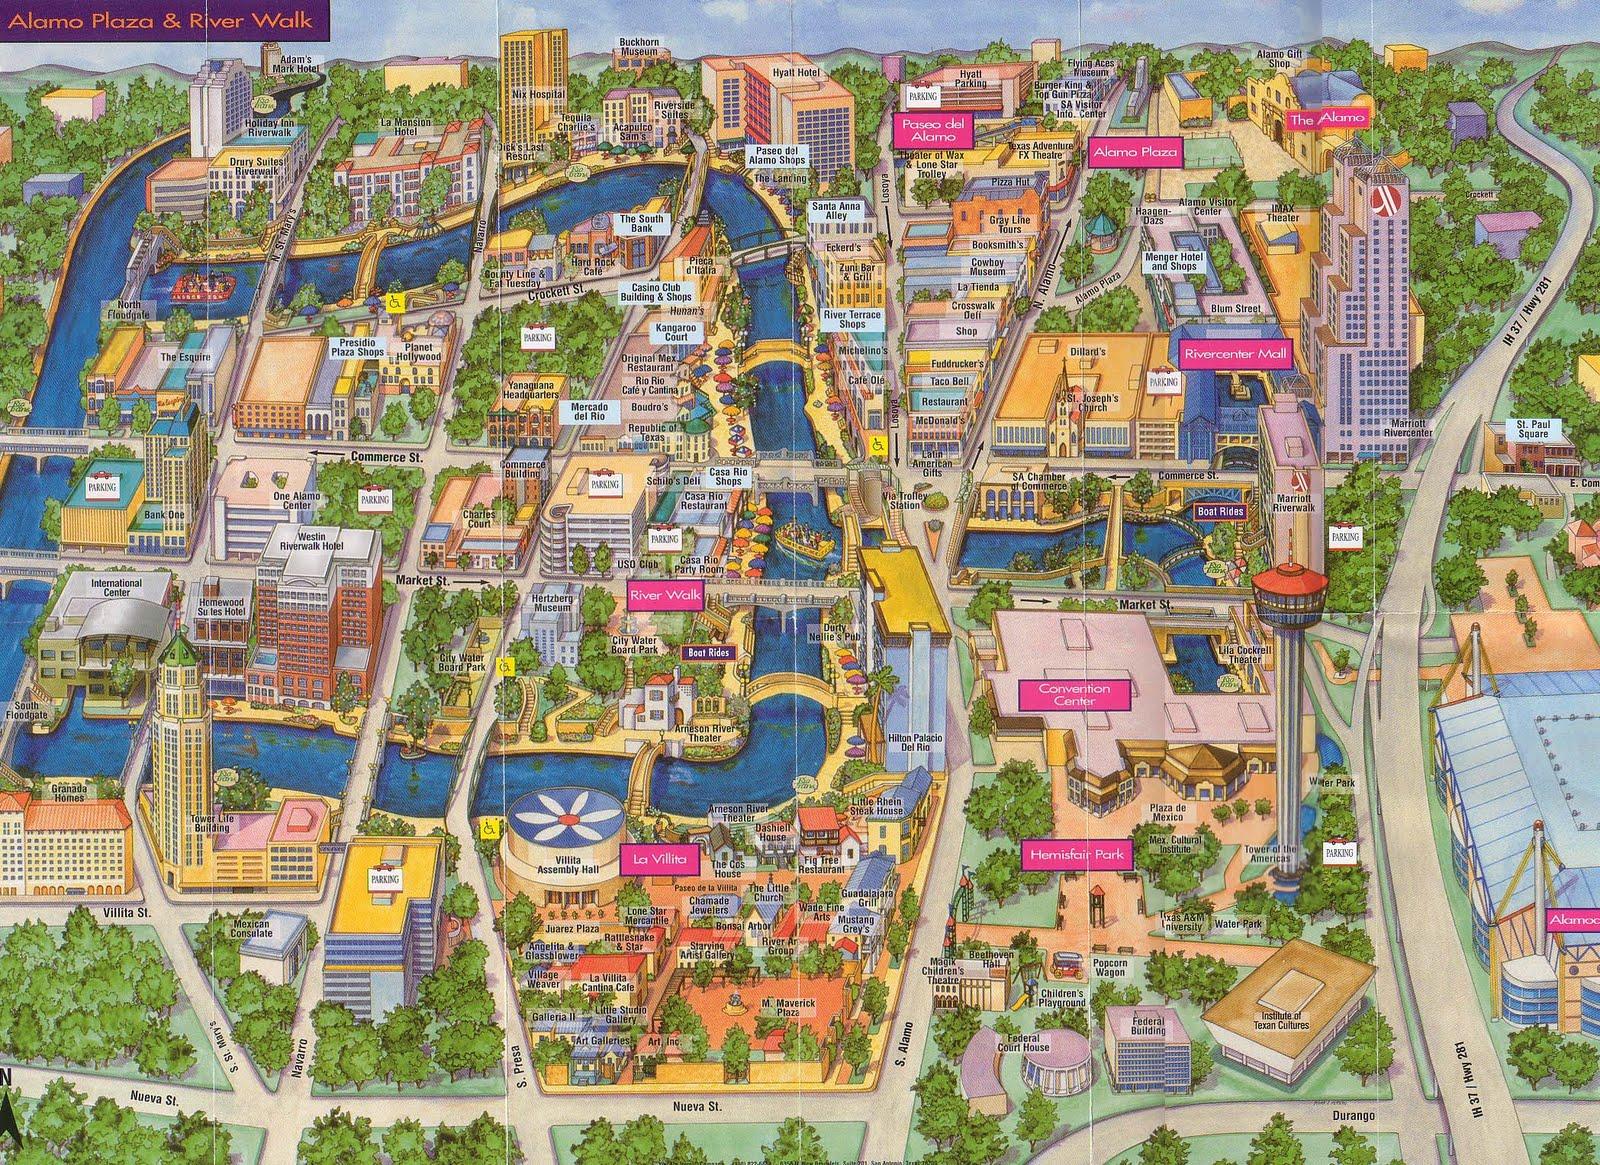 Map of Downtown San Antonio Downtown San Antonio History